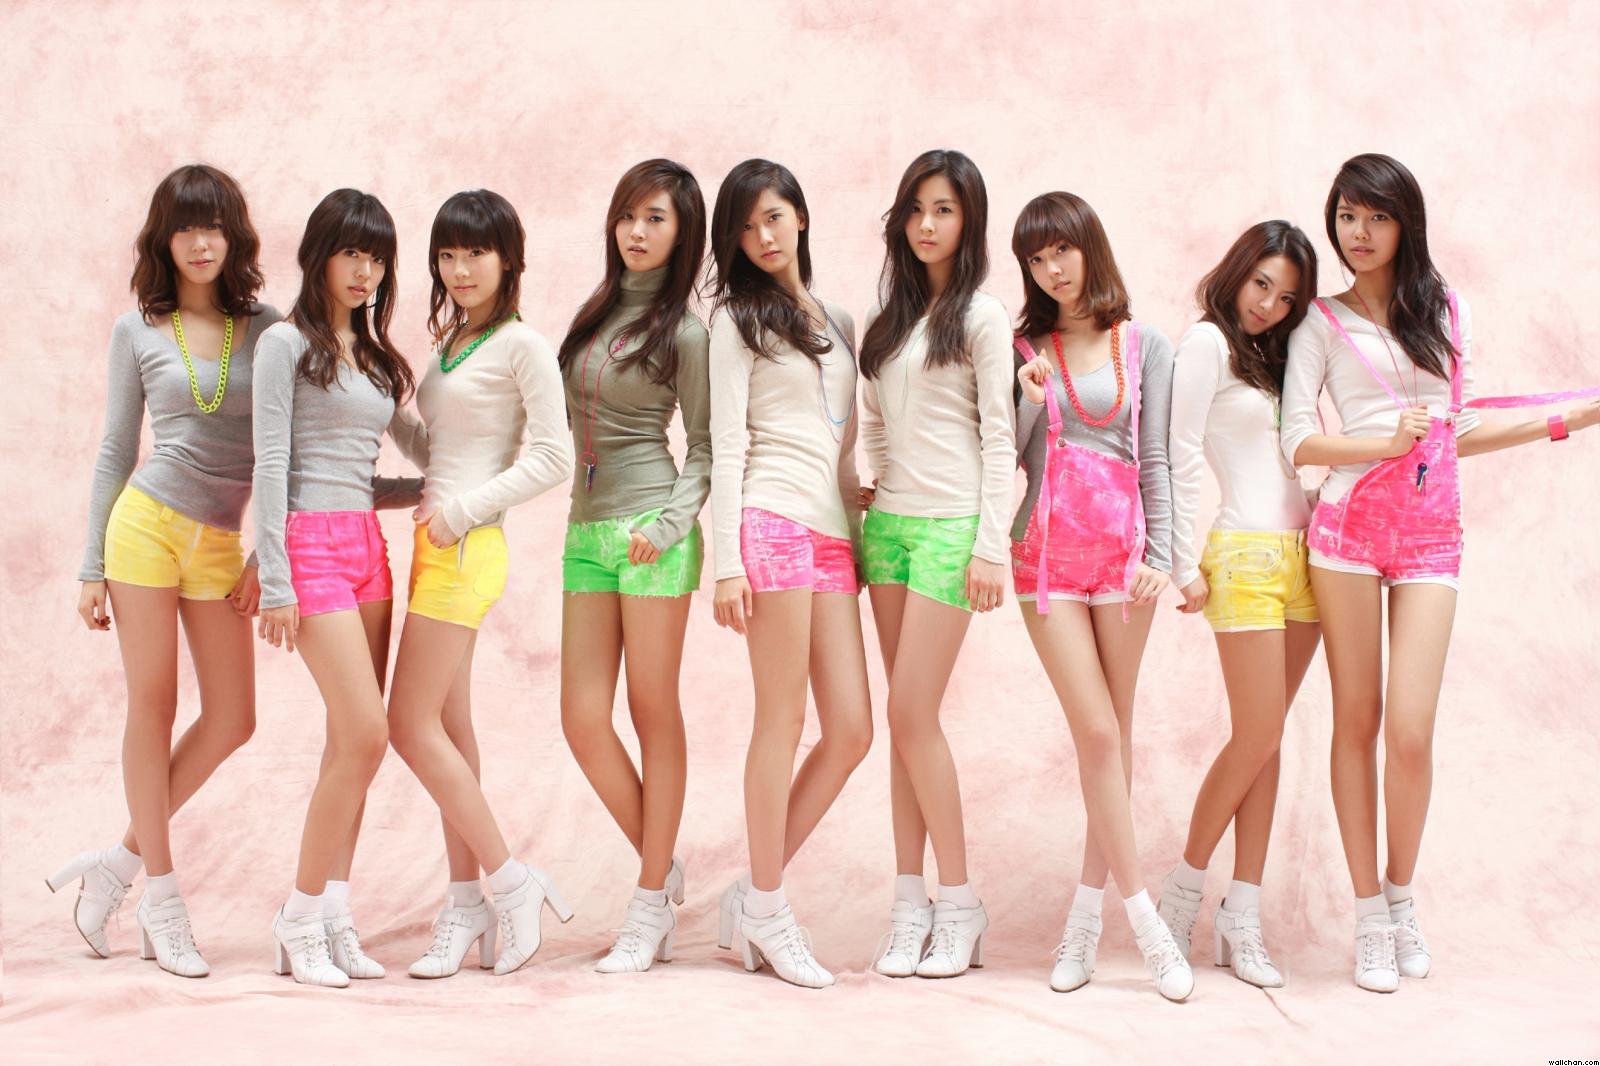 http://3.bp.blogspot.com/-5-RbYNxXR5g/TpZXSMZNFTI/AAAAAAAAACM/nkZ7Cskphoc/s1600/1305829473-girls-generation-snsd-tiffany-sunny-seohyun-korean-kpop-jessica-jung-kim-taeyeon-kwon-yuri-im-yoona-kim-hyoyeon-choi-sooyoung-wallpaper.jpg